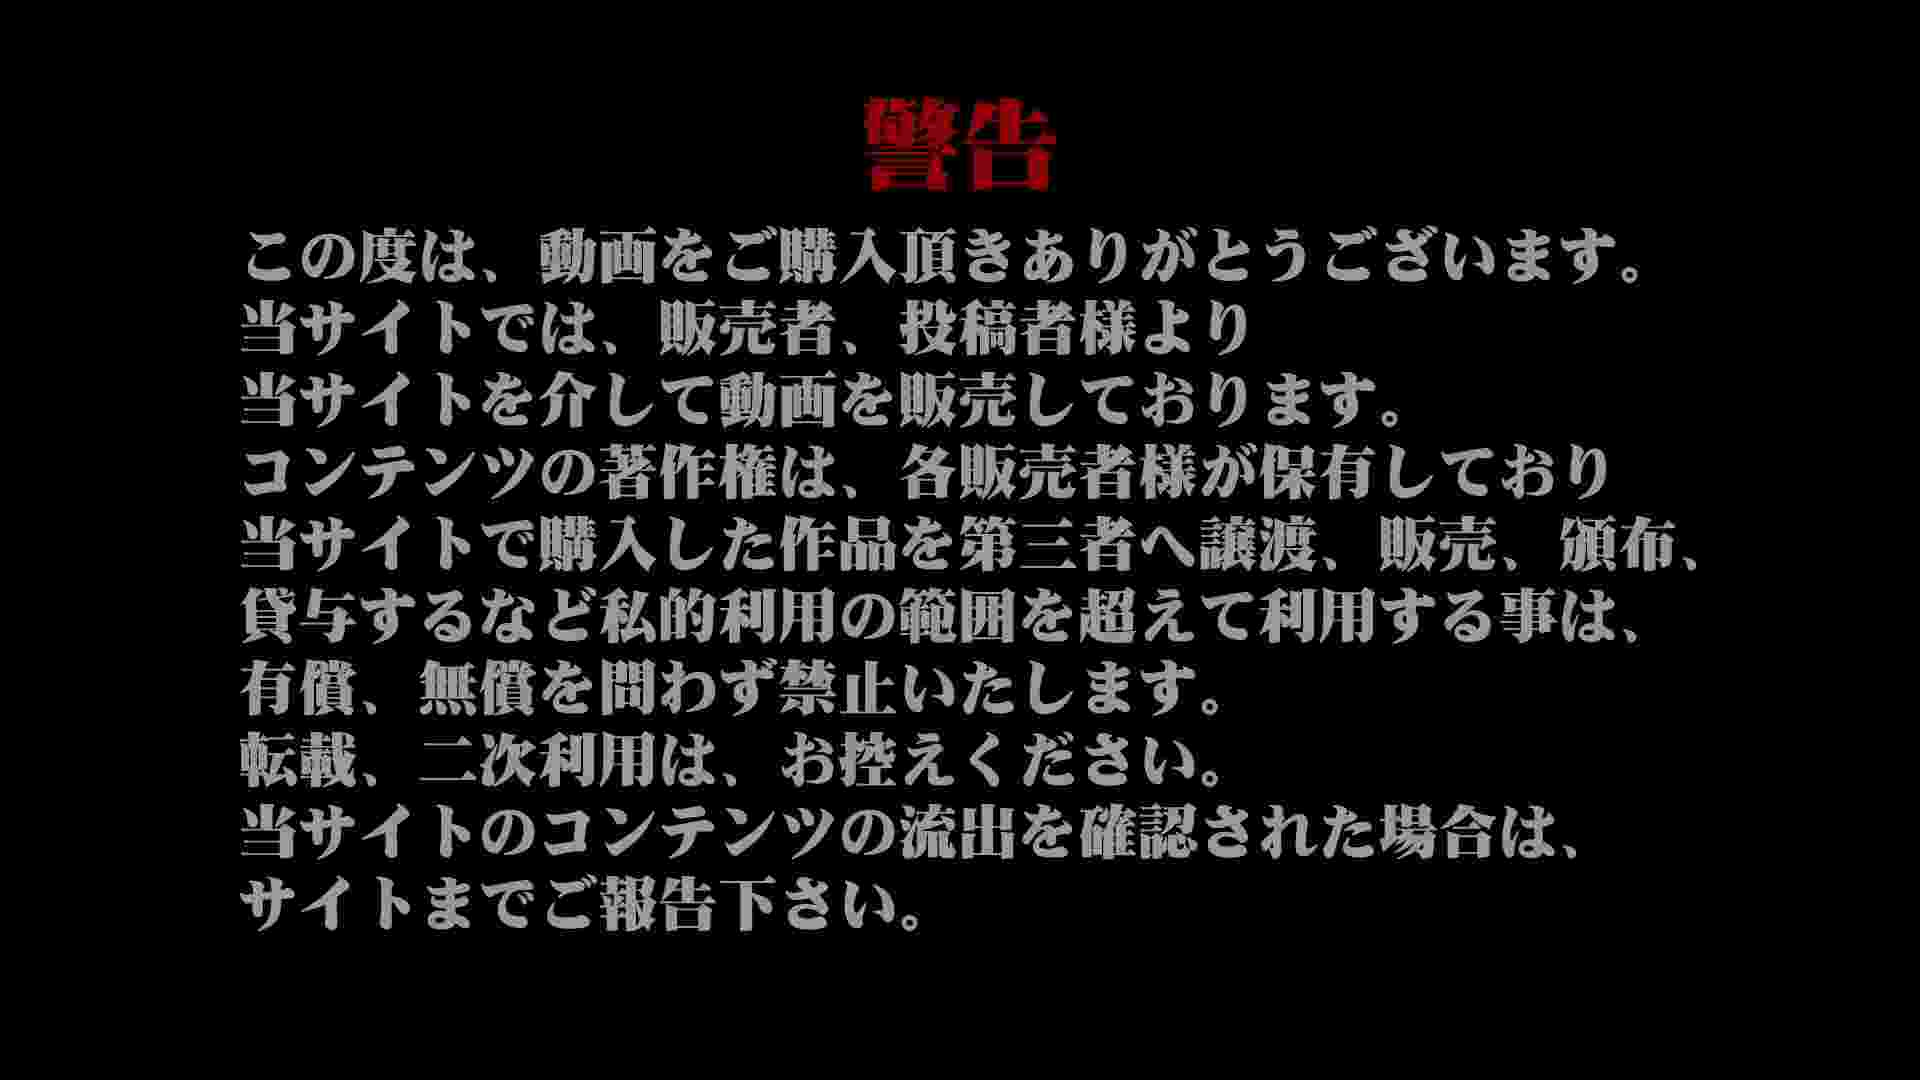 Aquaな露天風呂Vol.951 盗撮師作品 | 露天風呂突入  96pic 1